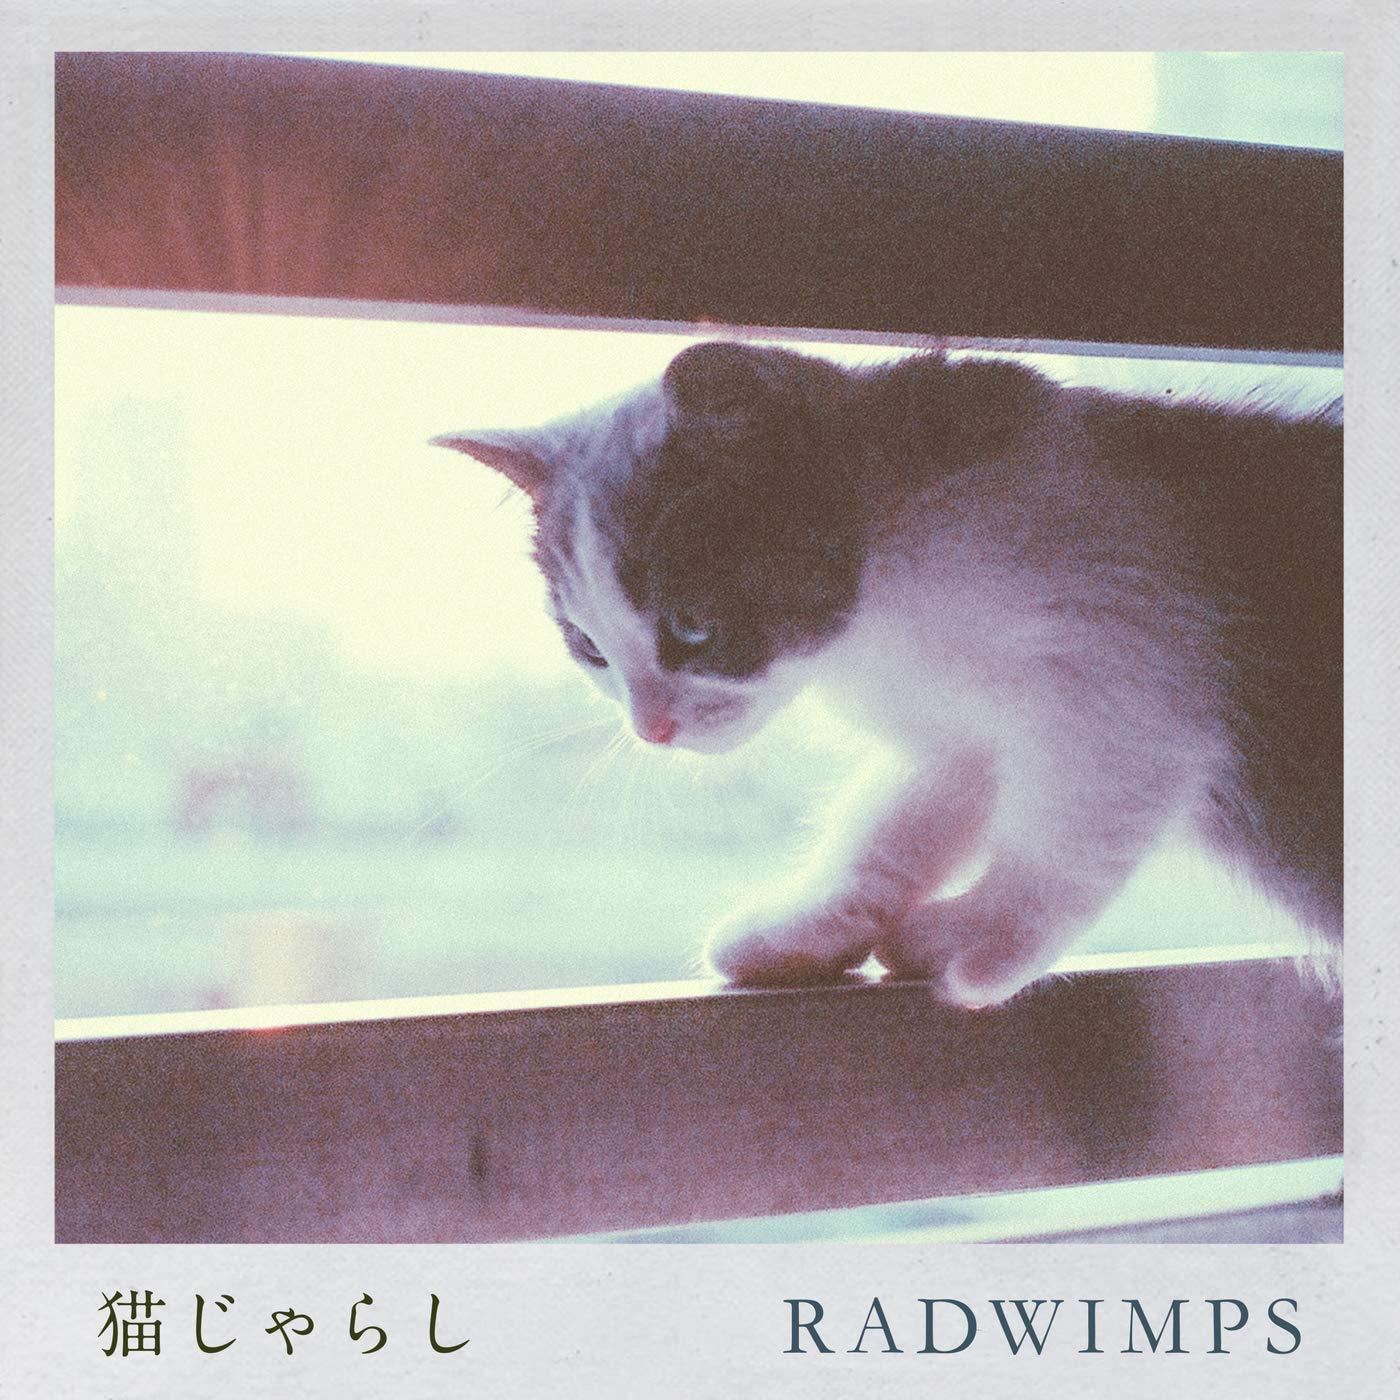 RADWIMPS – 猫じゃらし [24bit Lossless + MP3 320 / WEB] [2020.04.06]